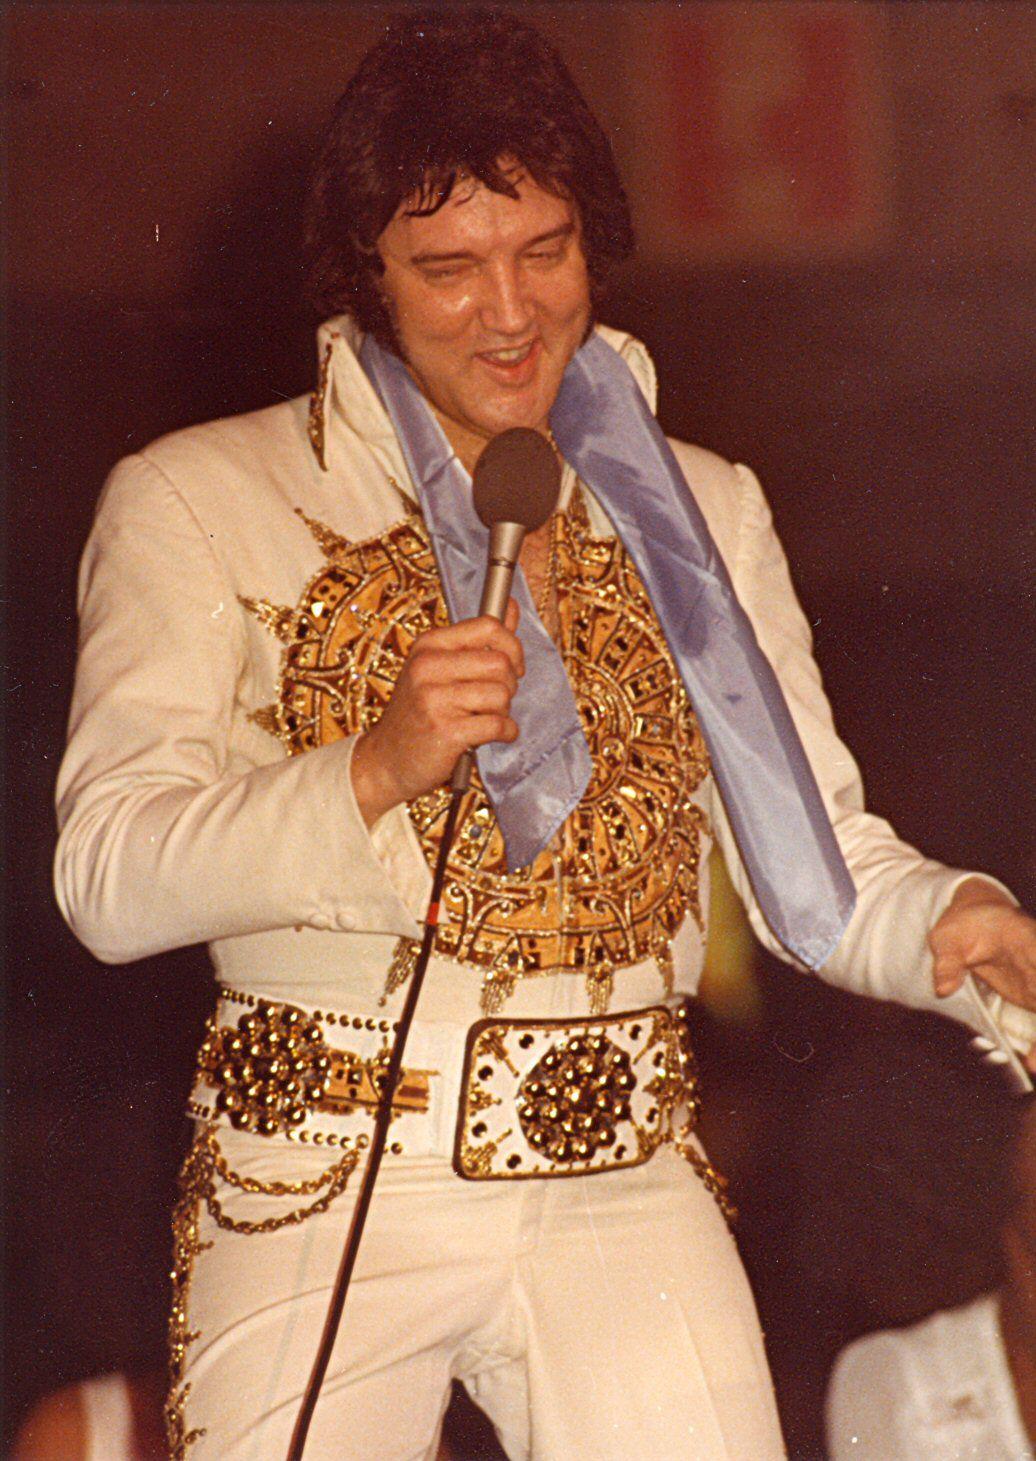 1977 5 28 Philadelphia, PA.